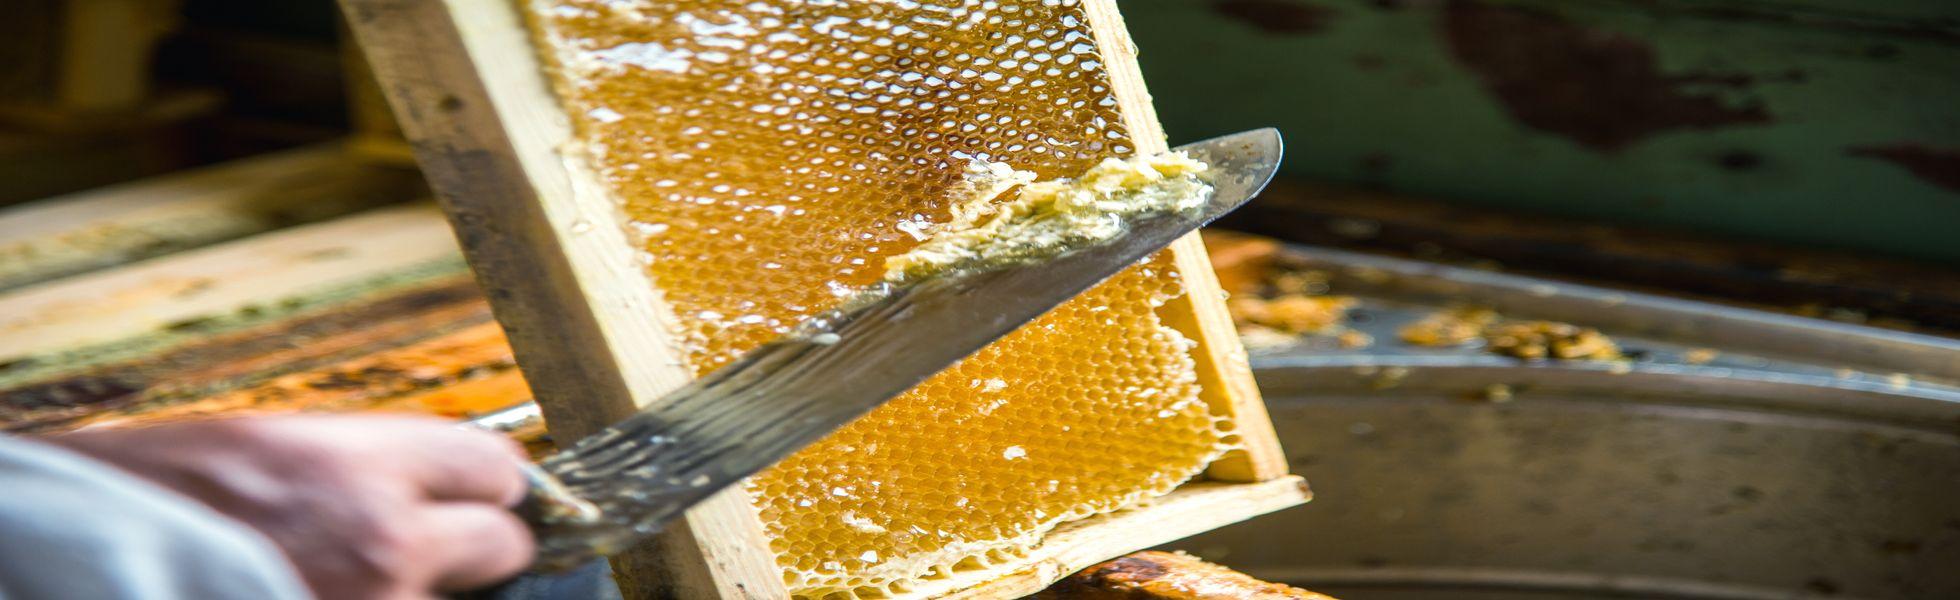 Hampshire-honeycomb